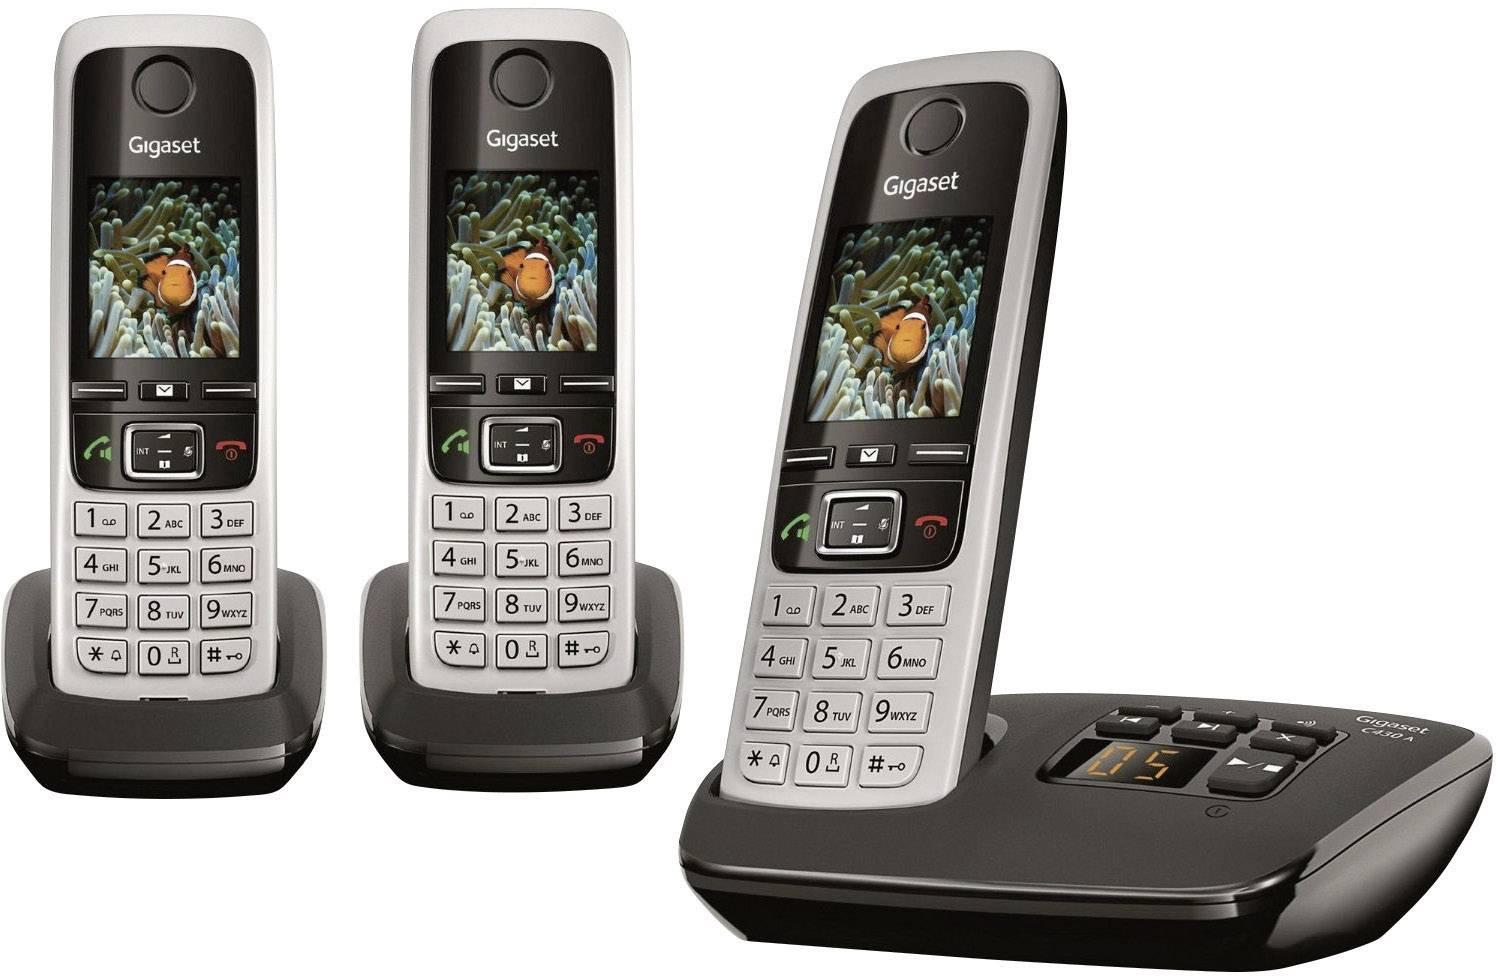 Bezdrátový analogový telefon Gigaset C430A Trio, stříbrná, černá